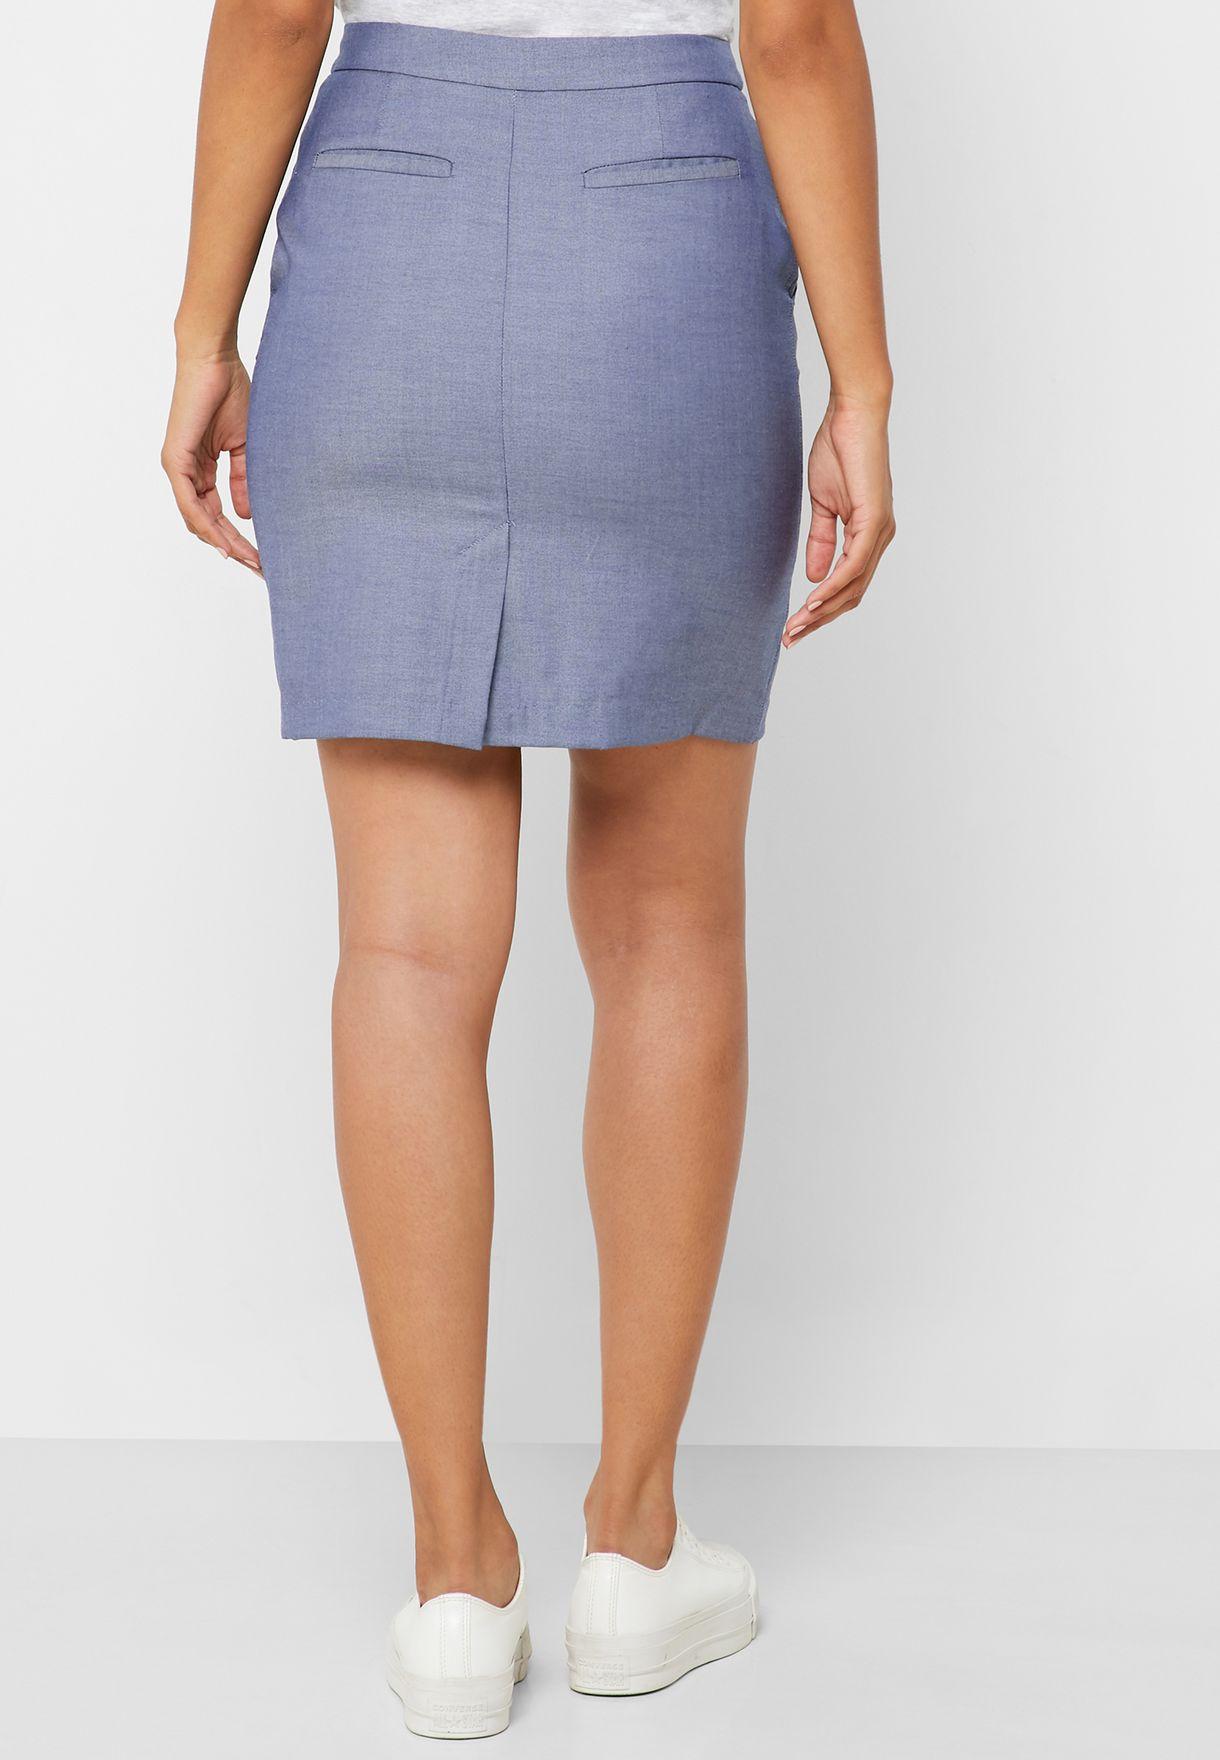 Gant Pencil Mini Skirt - Fashion